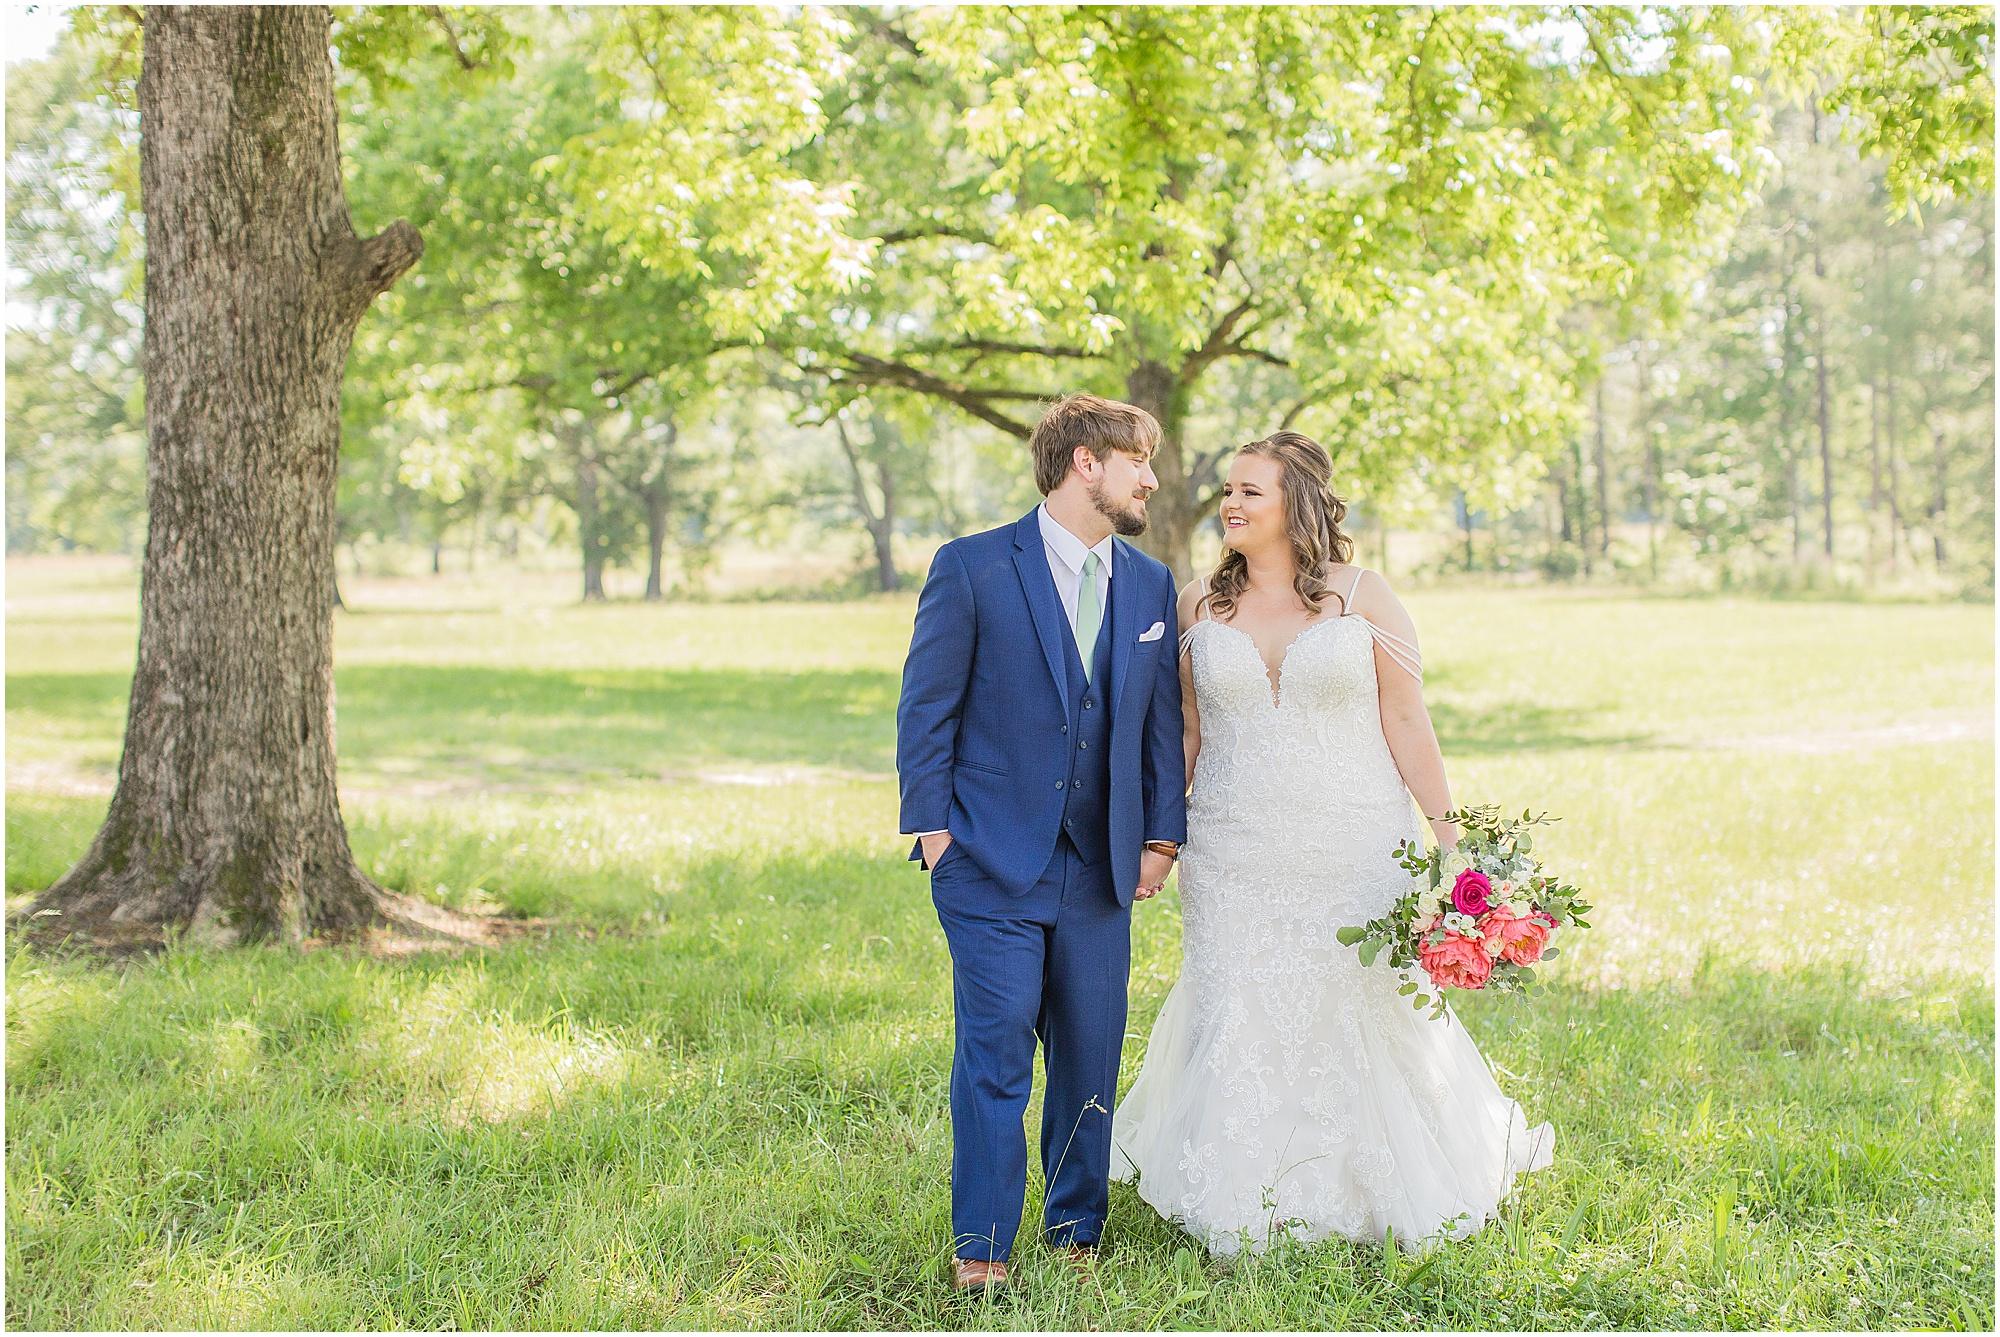 starkville-mississippi-wedding-page-place-dodson-farms_0035.jpg